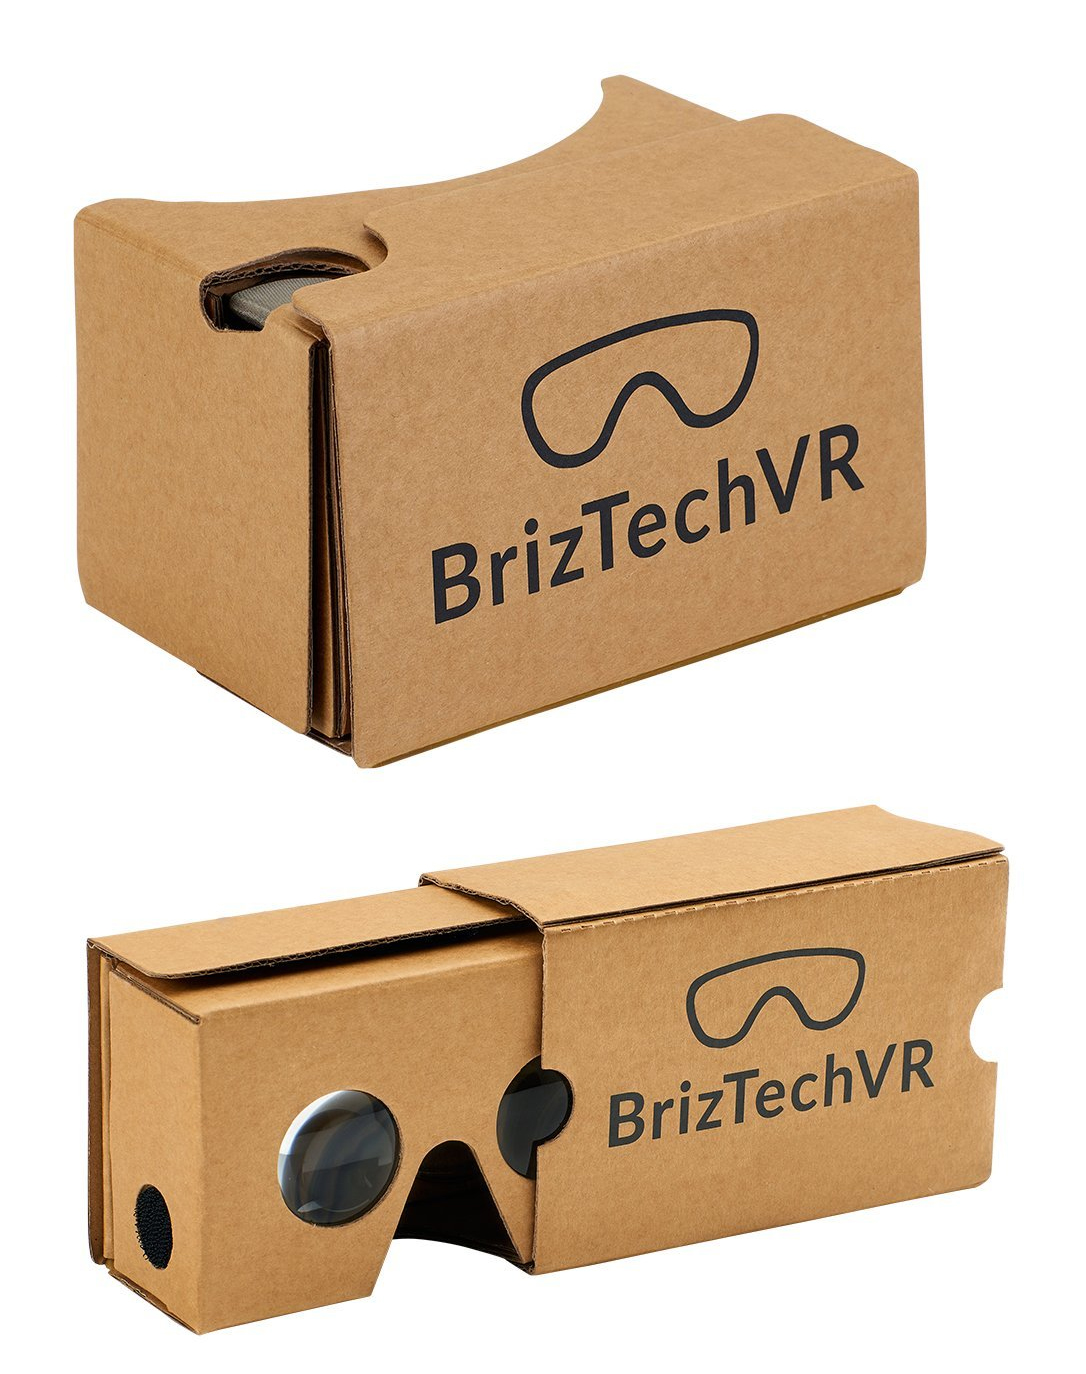 Google Cardboard v2.0 Virtual Reality Headset vr headset 2016